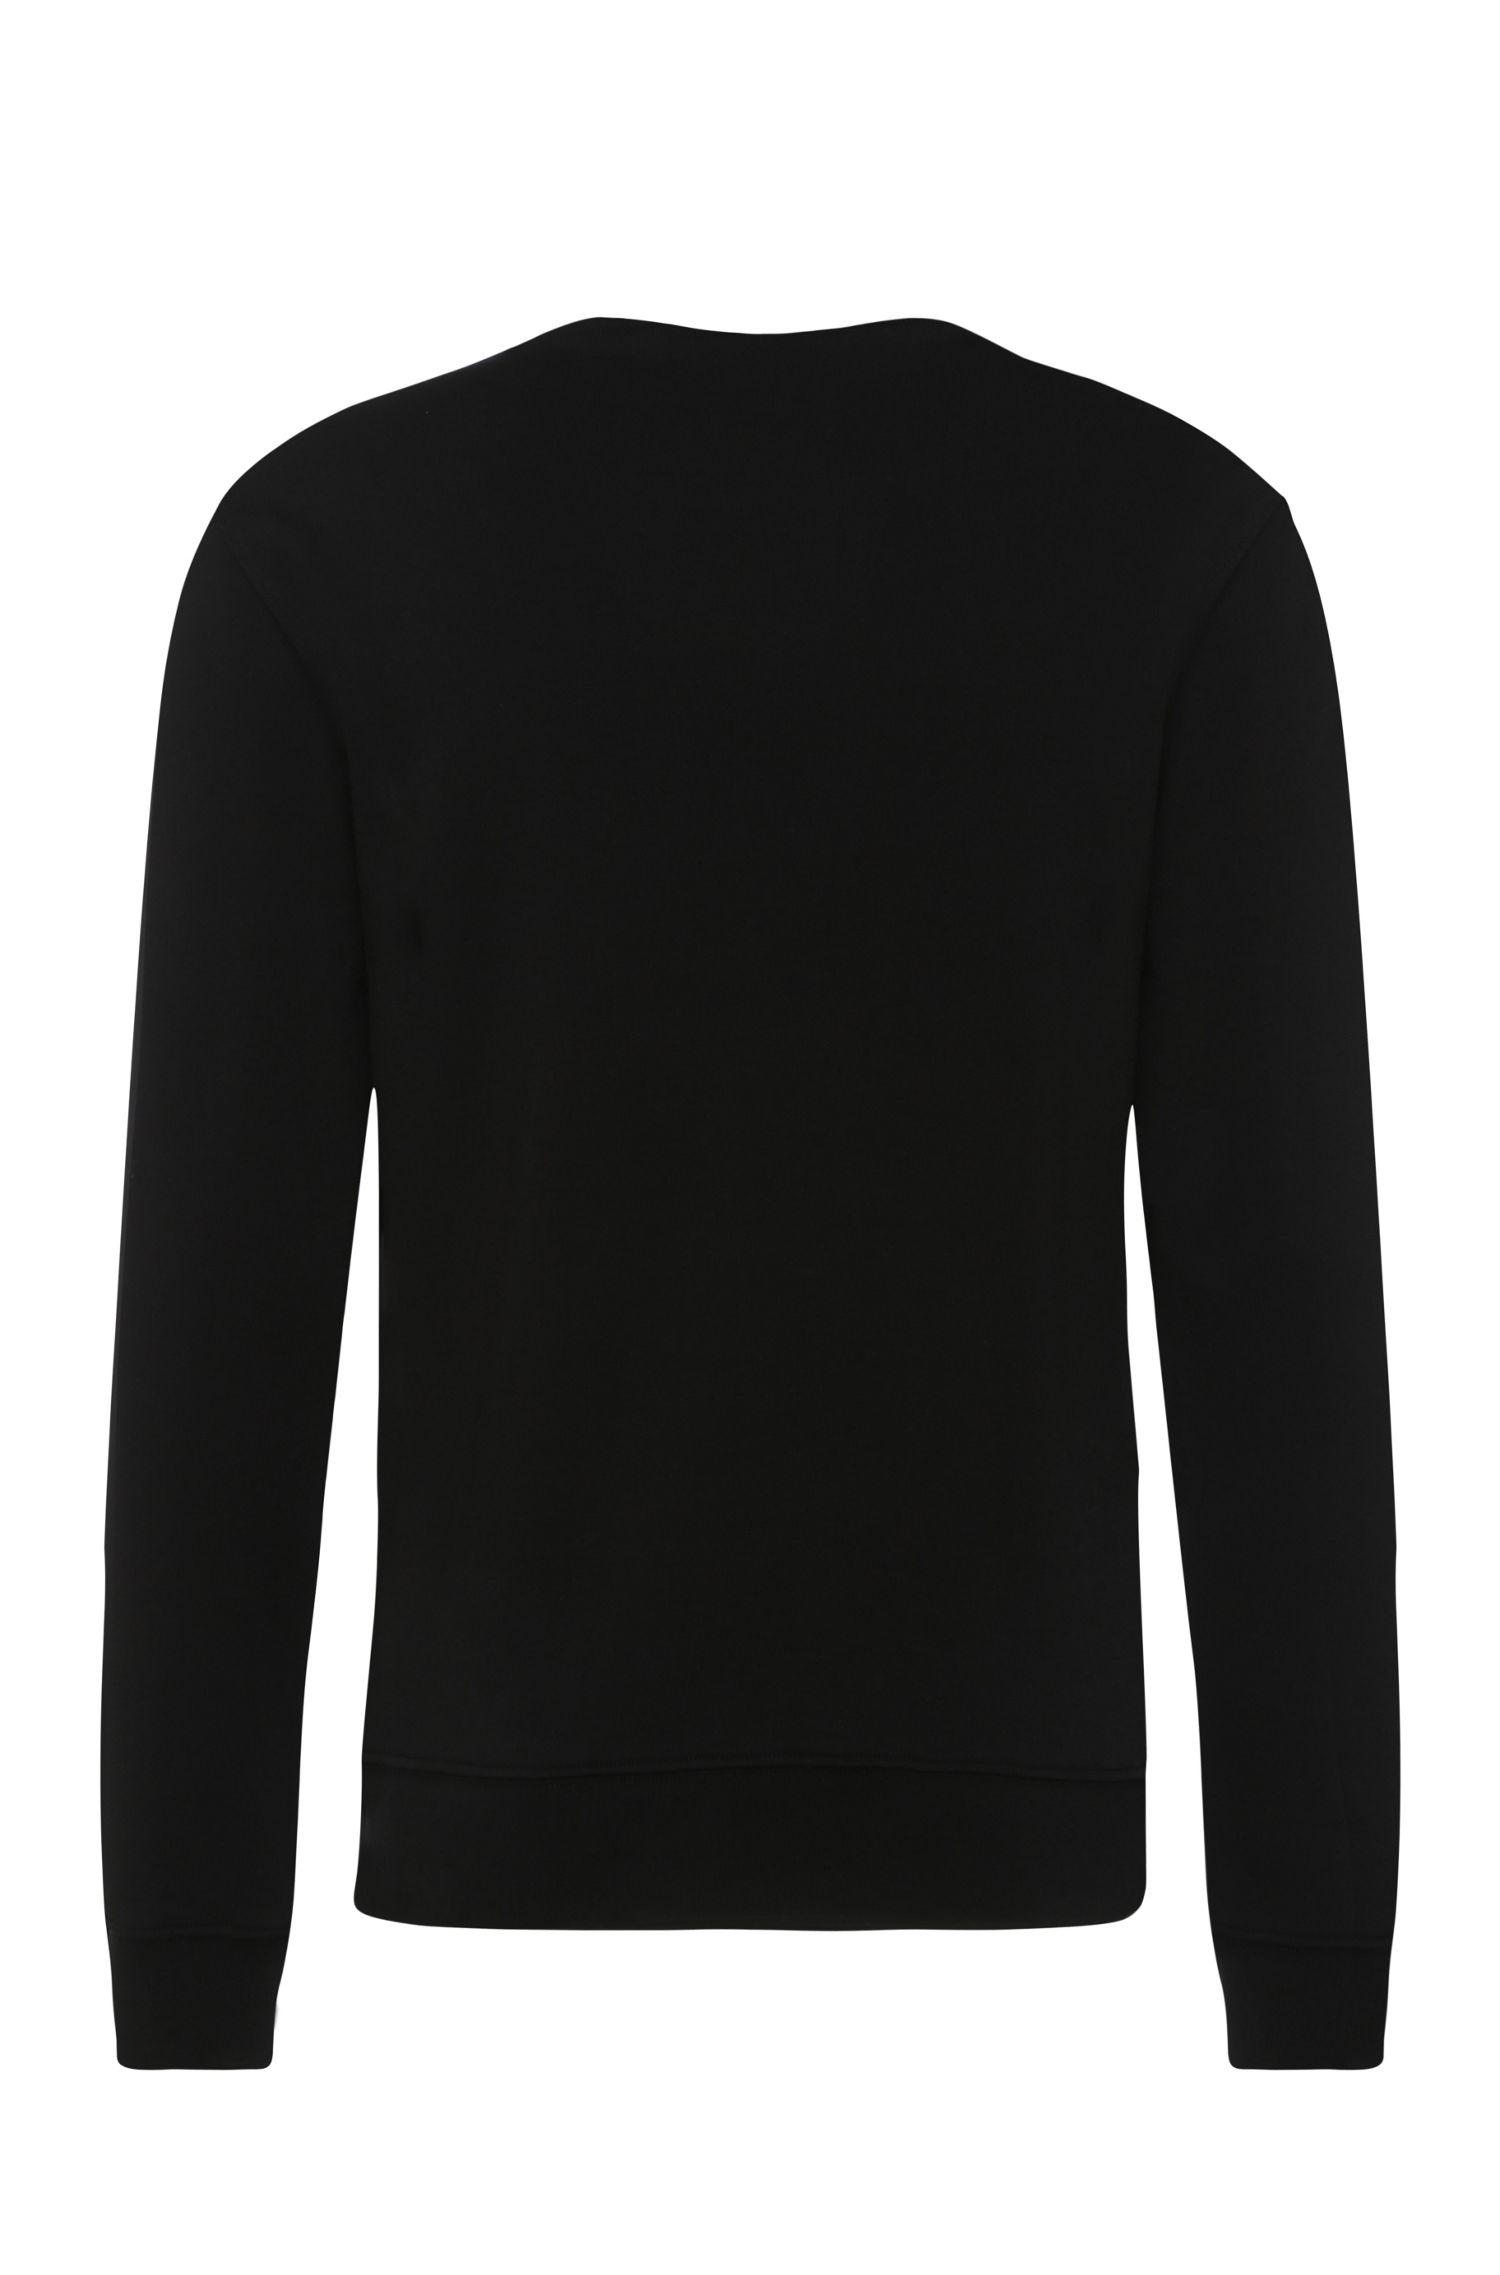 Cotton Lily Print Sweatshirt | Whit